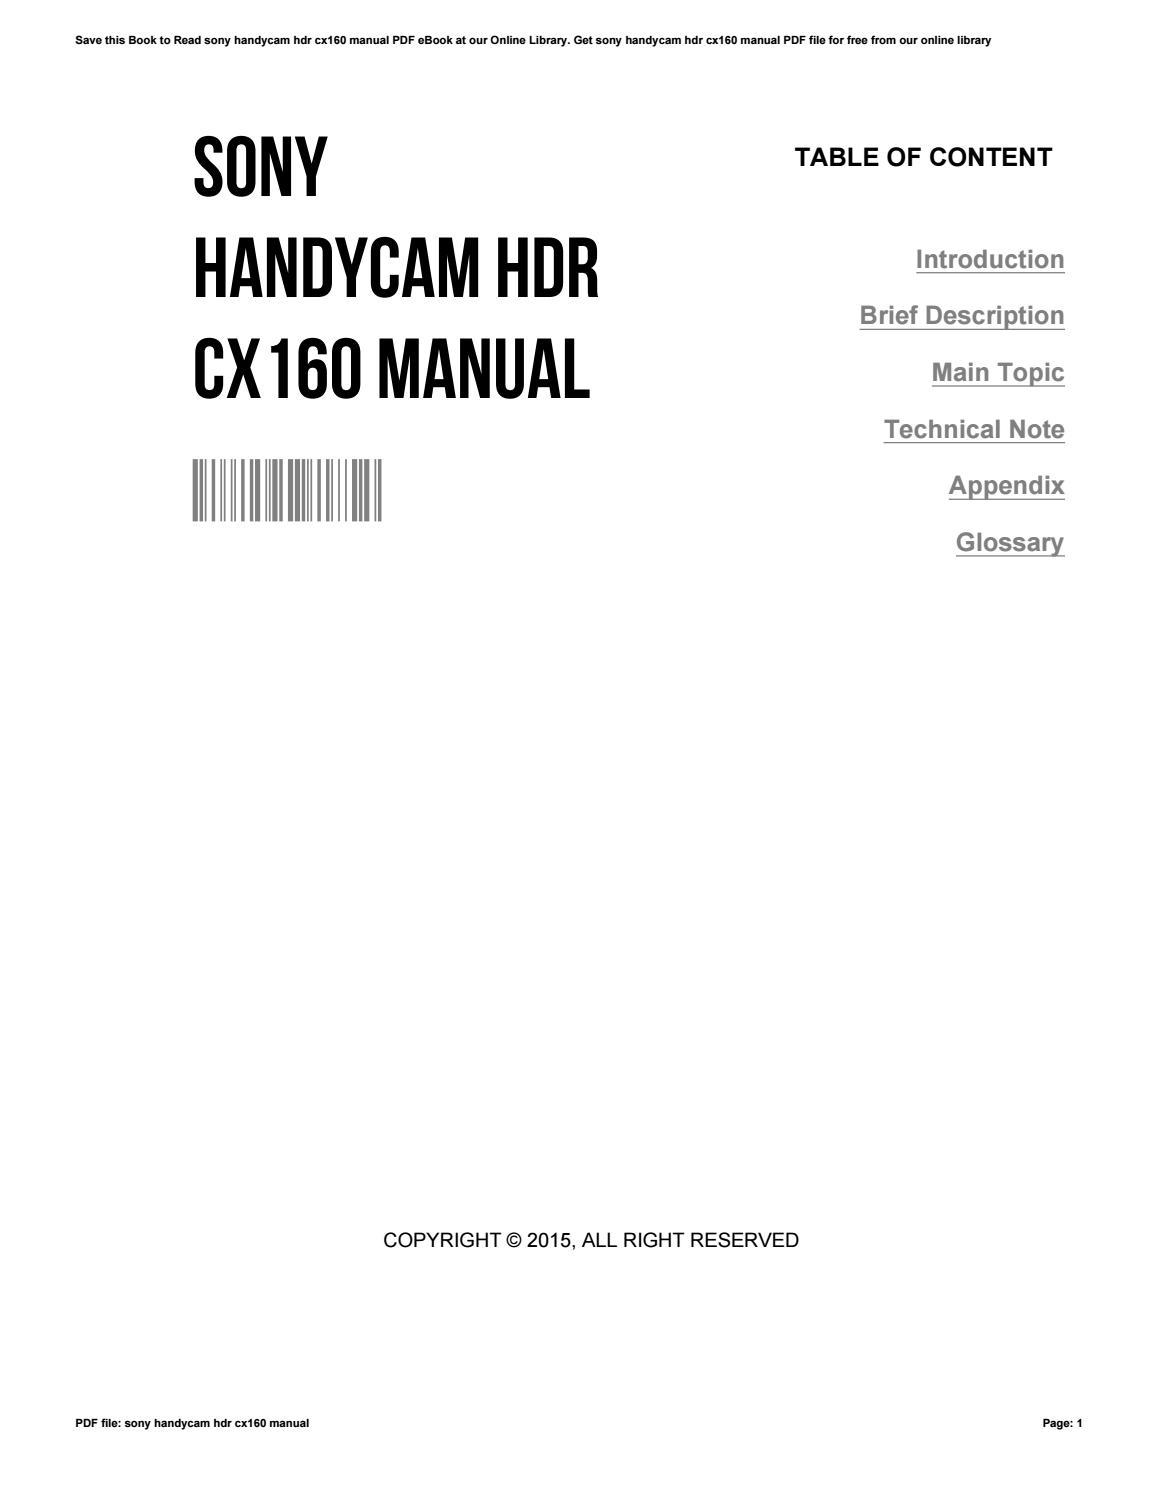 sony cx150 manual rh sony cx150 manual topmalawis de